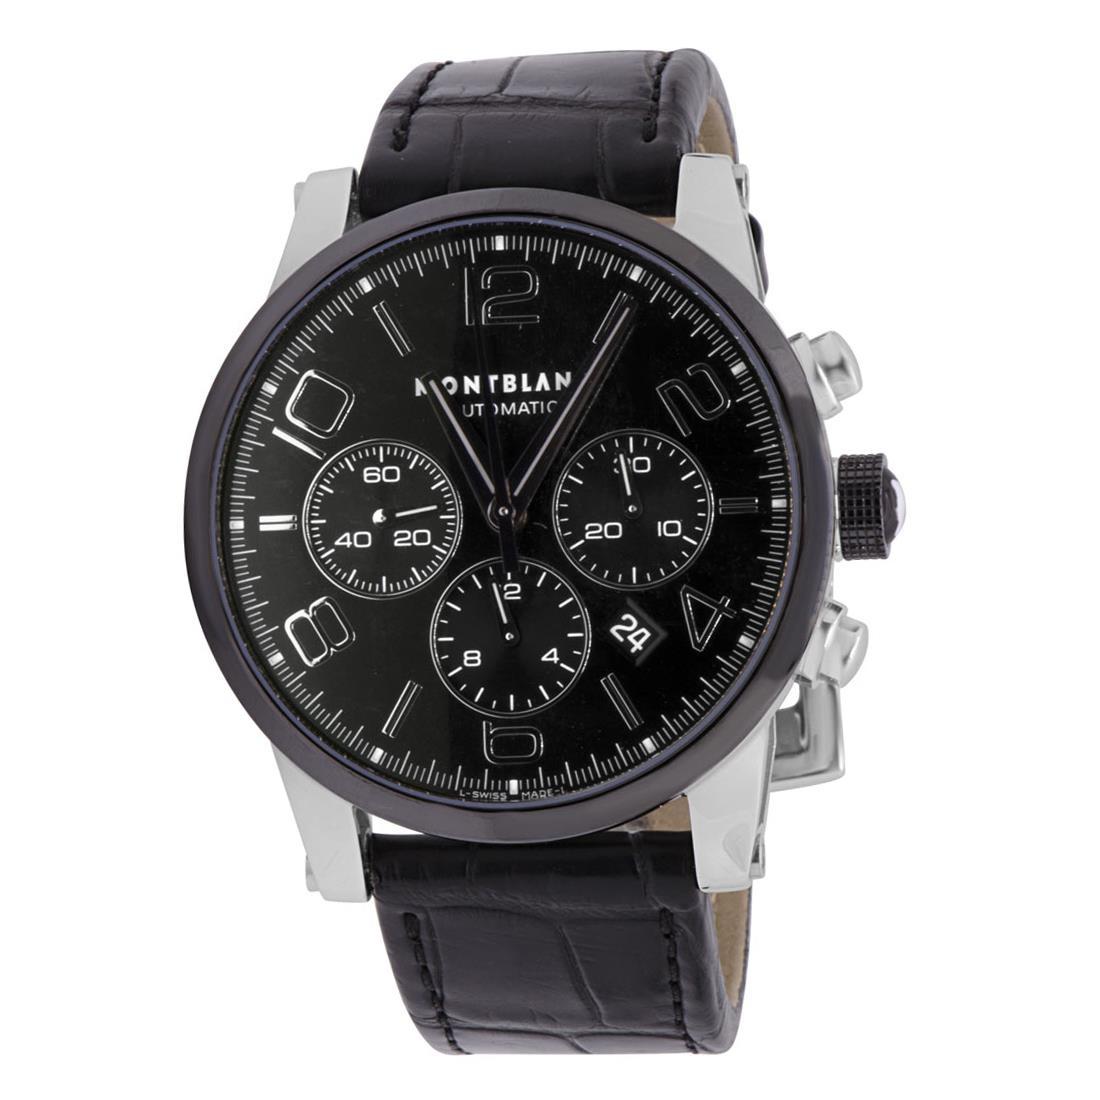 Orologio cronografo Timewalker 43 mm - MONTBLANC